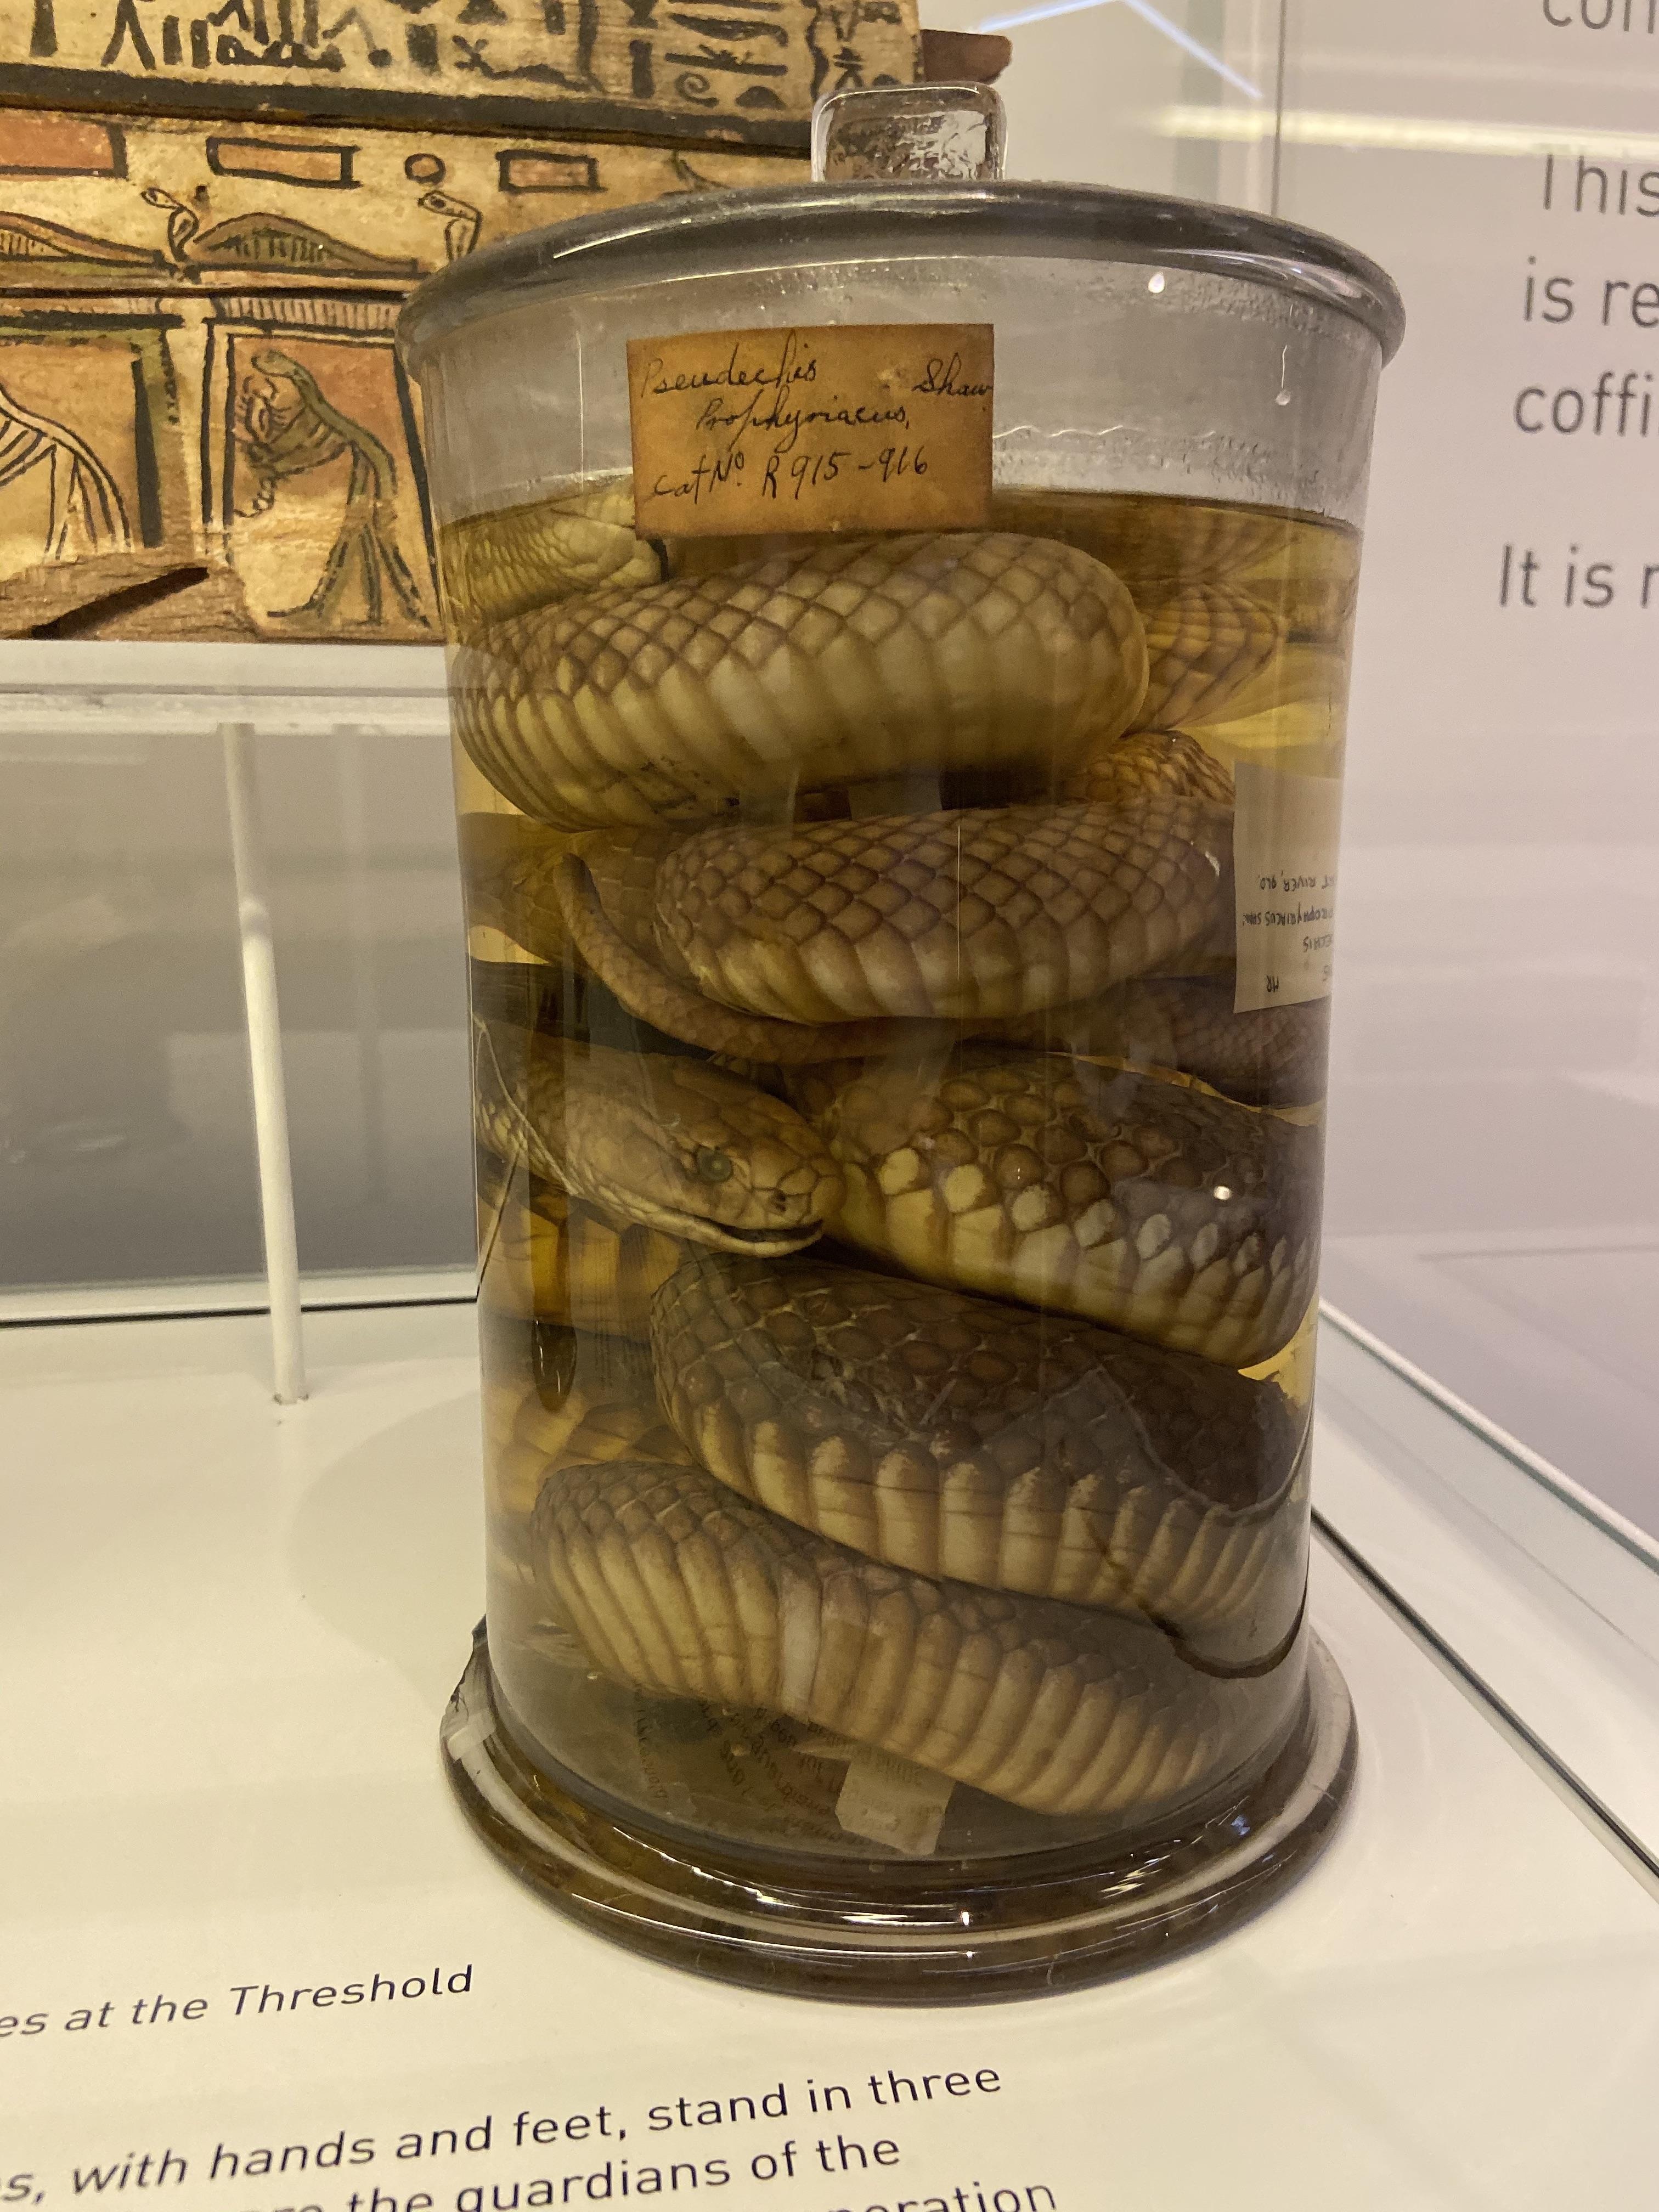 Snakes in a jar, Nicholson Museum, Sydney.jpg